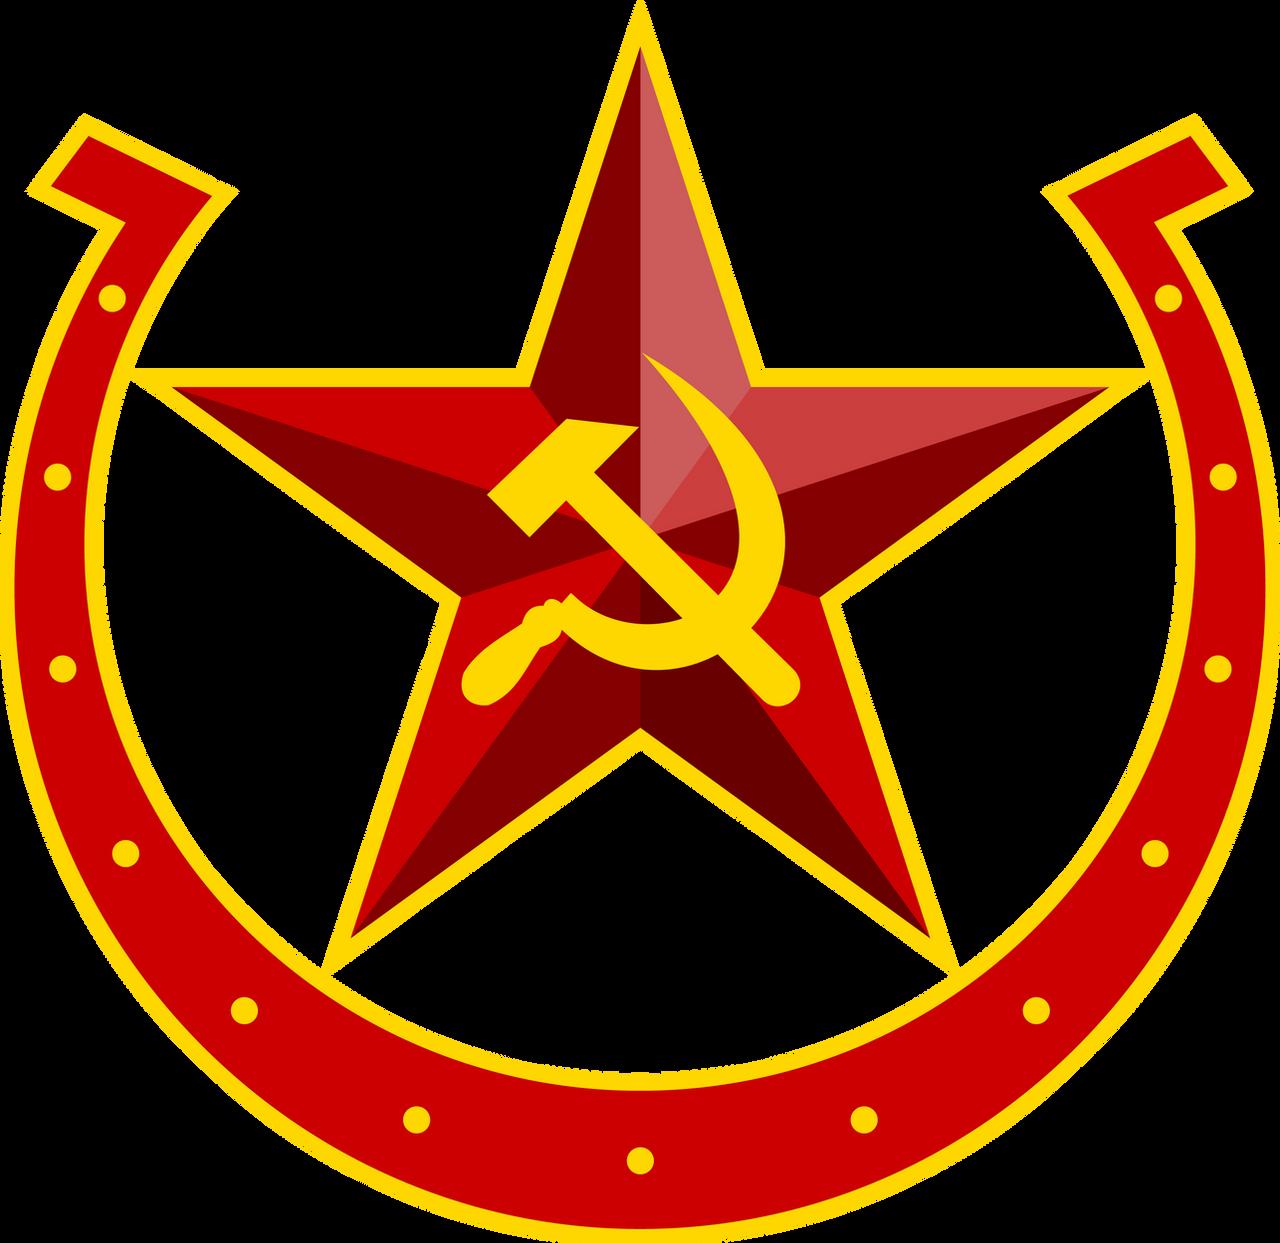 Soviet Equestria hammer-sickle-horseshoe emblem by QTMarx